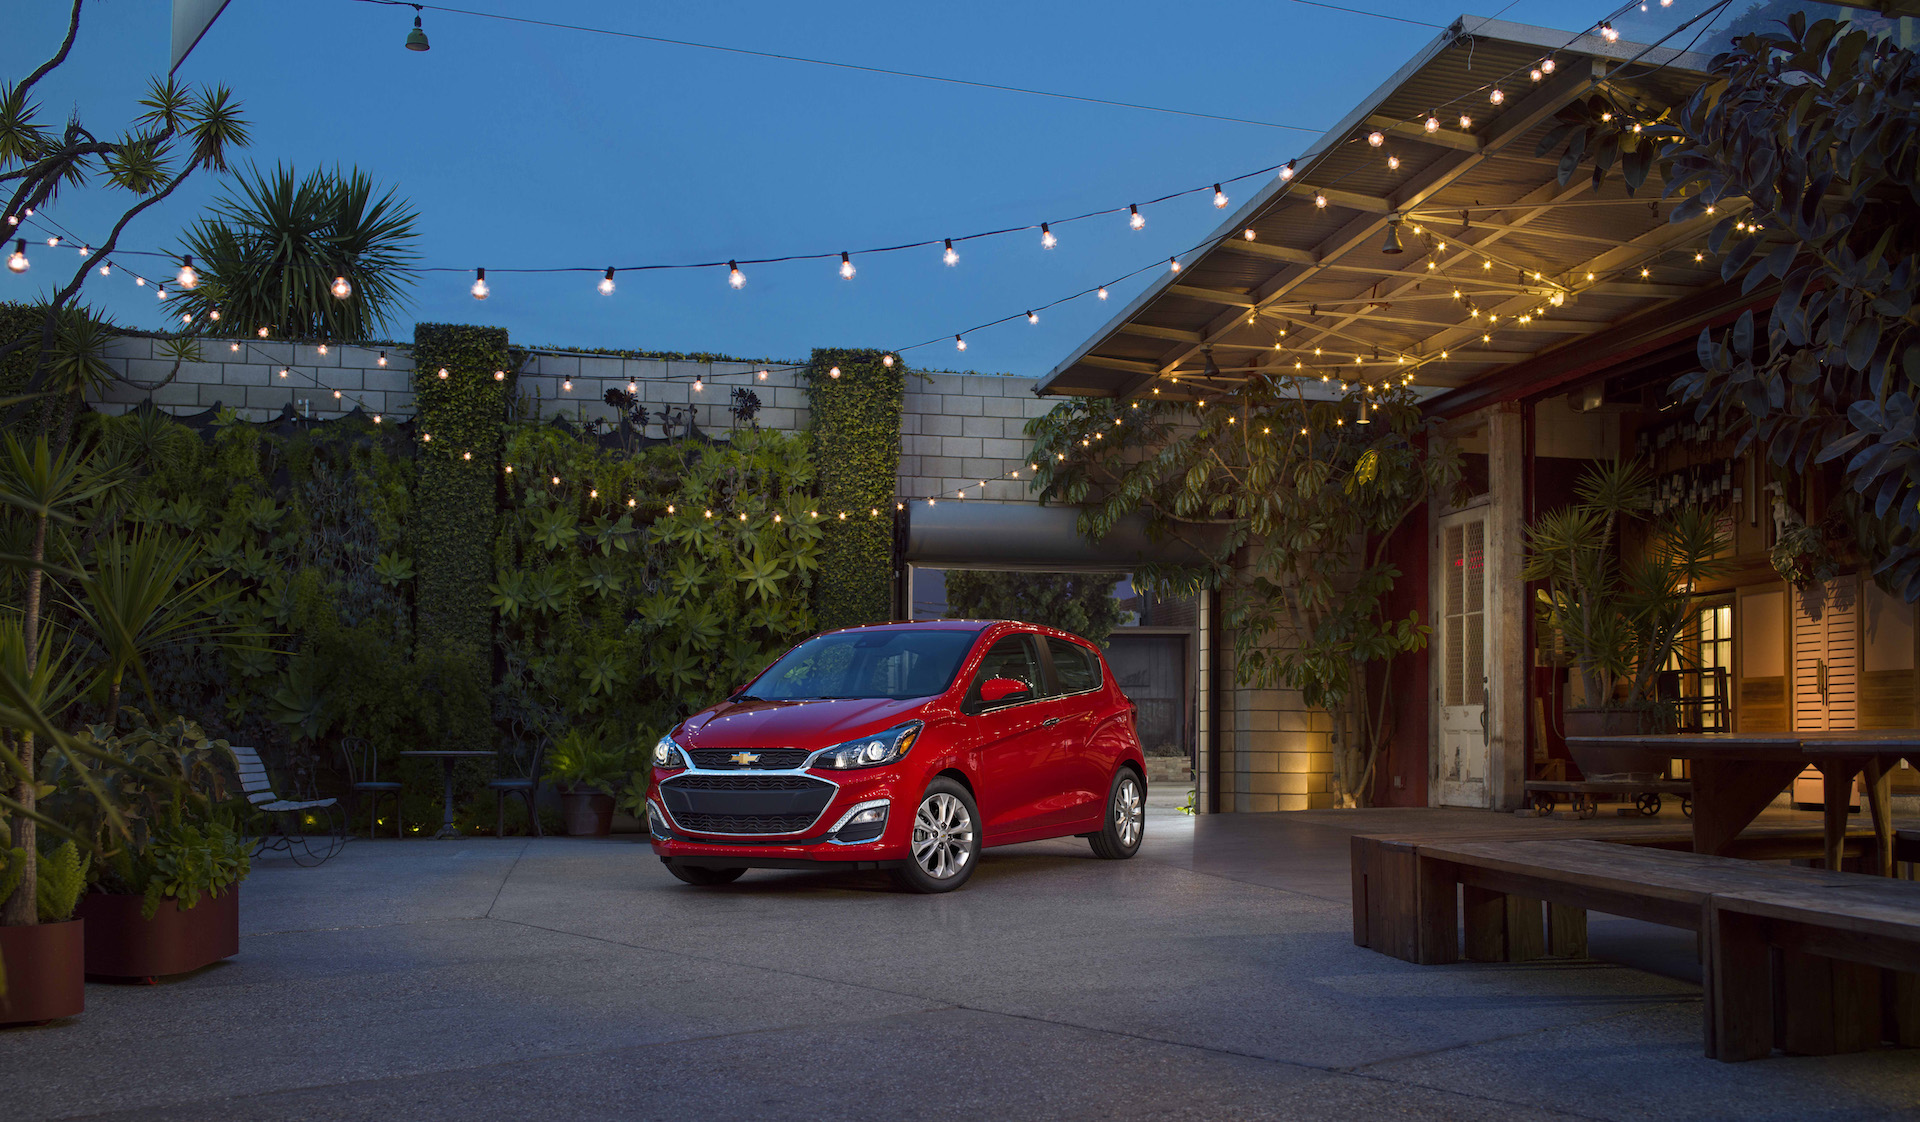 Kekurangan Spark Chevrolet 2019 Harga